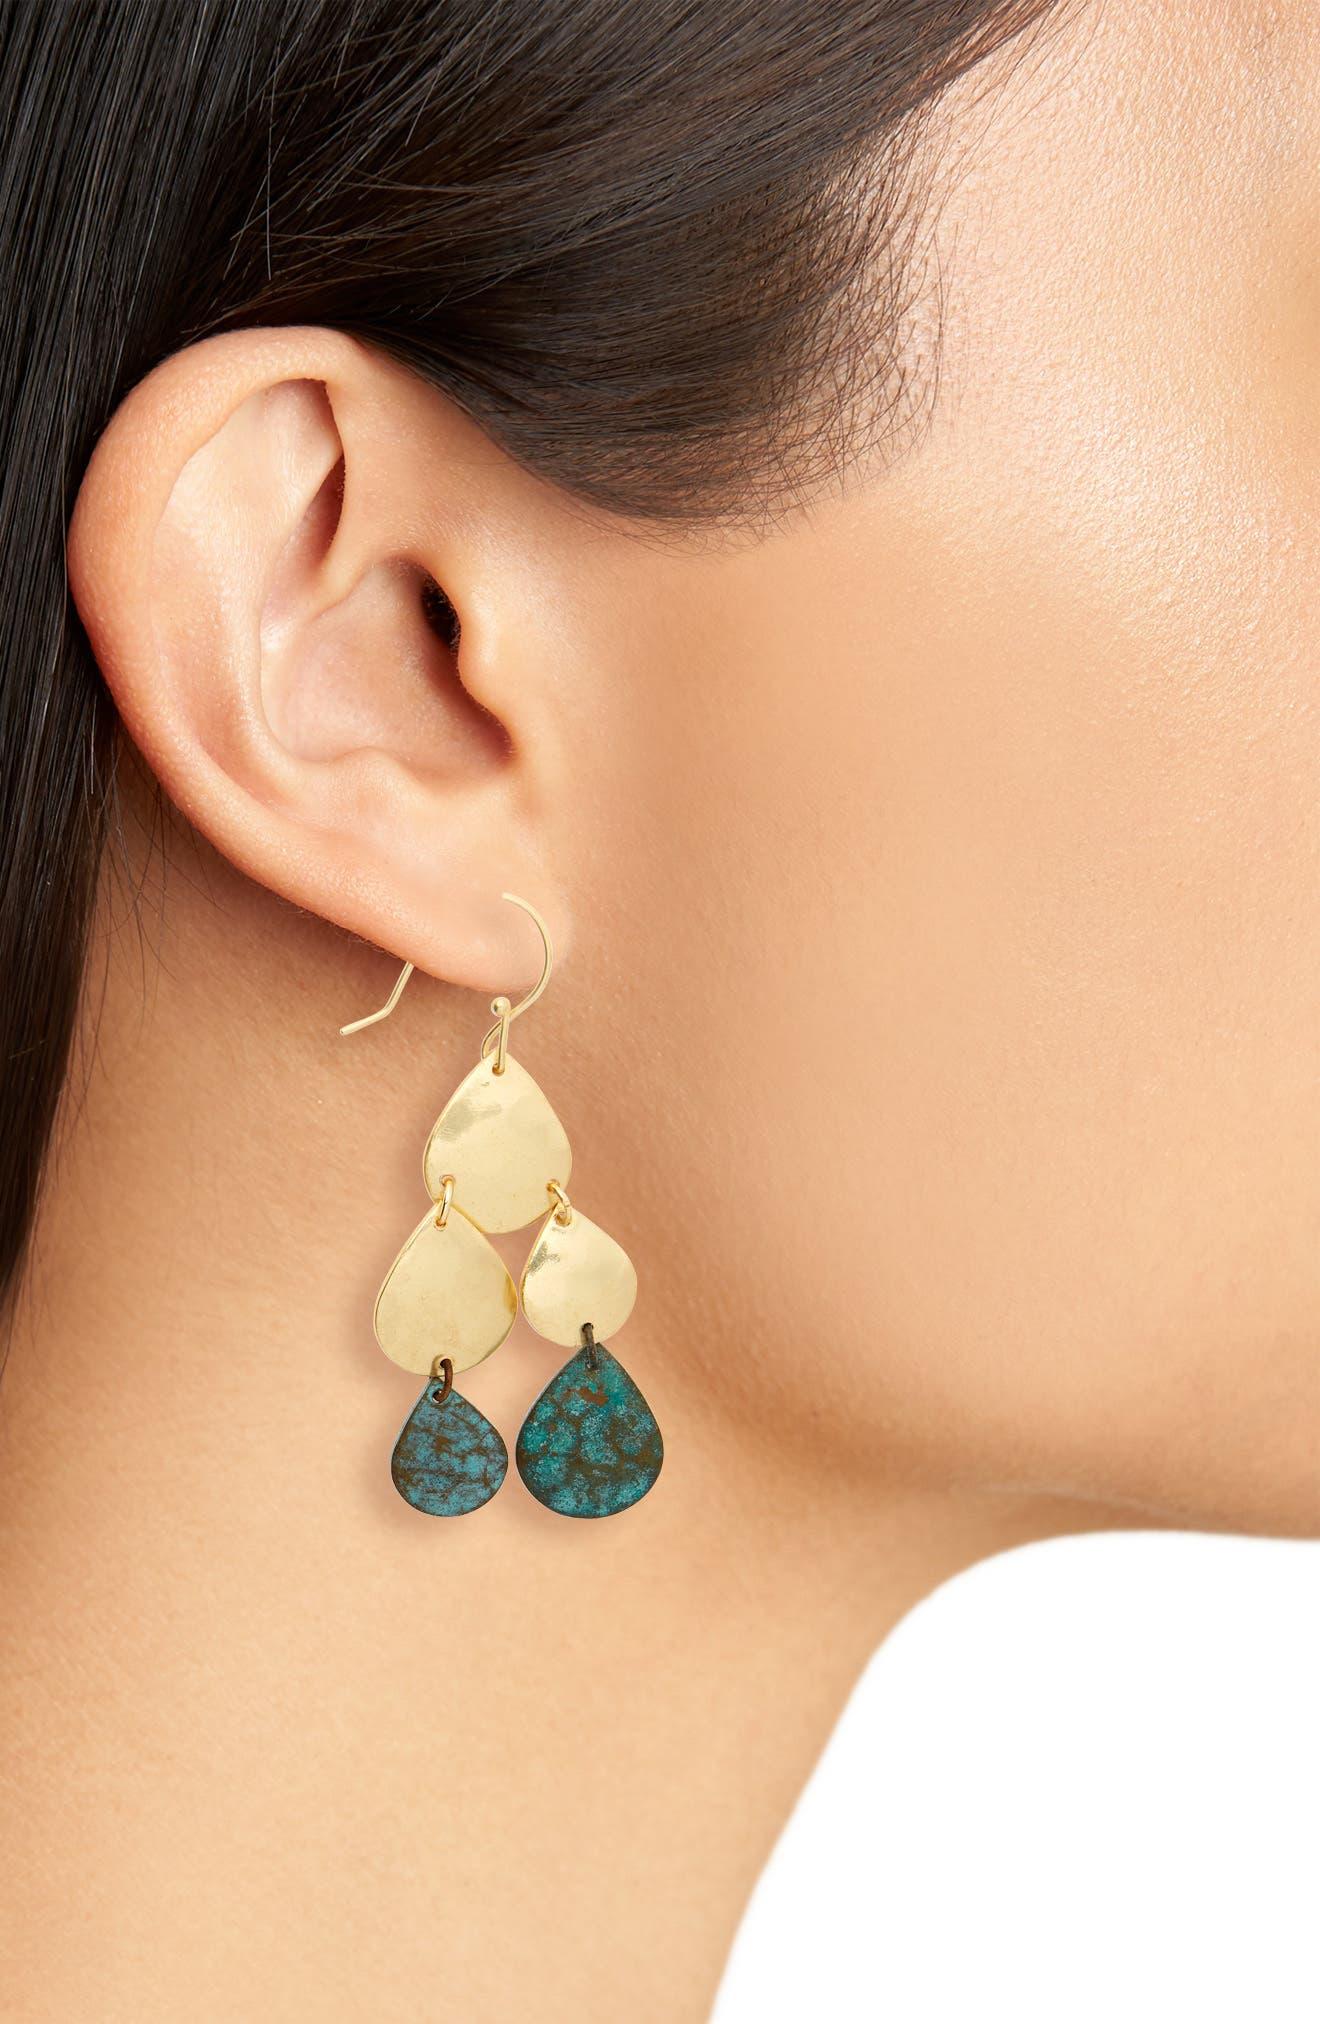 Patina Teardrops Earrings,                             Alternate thumbnail 2, color,                             Gold/ Multi